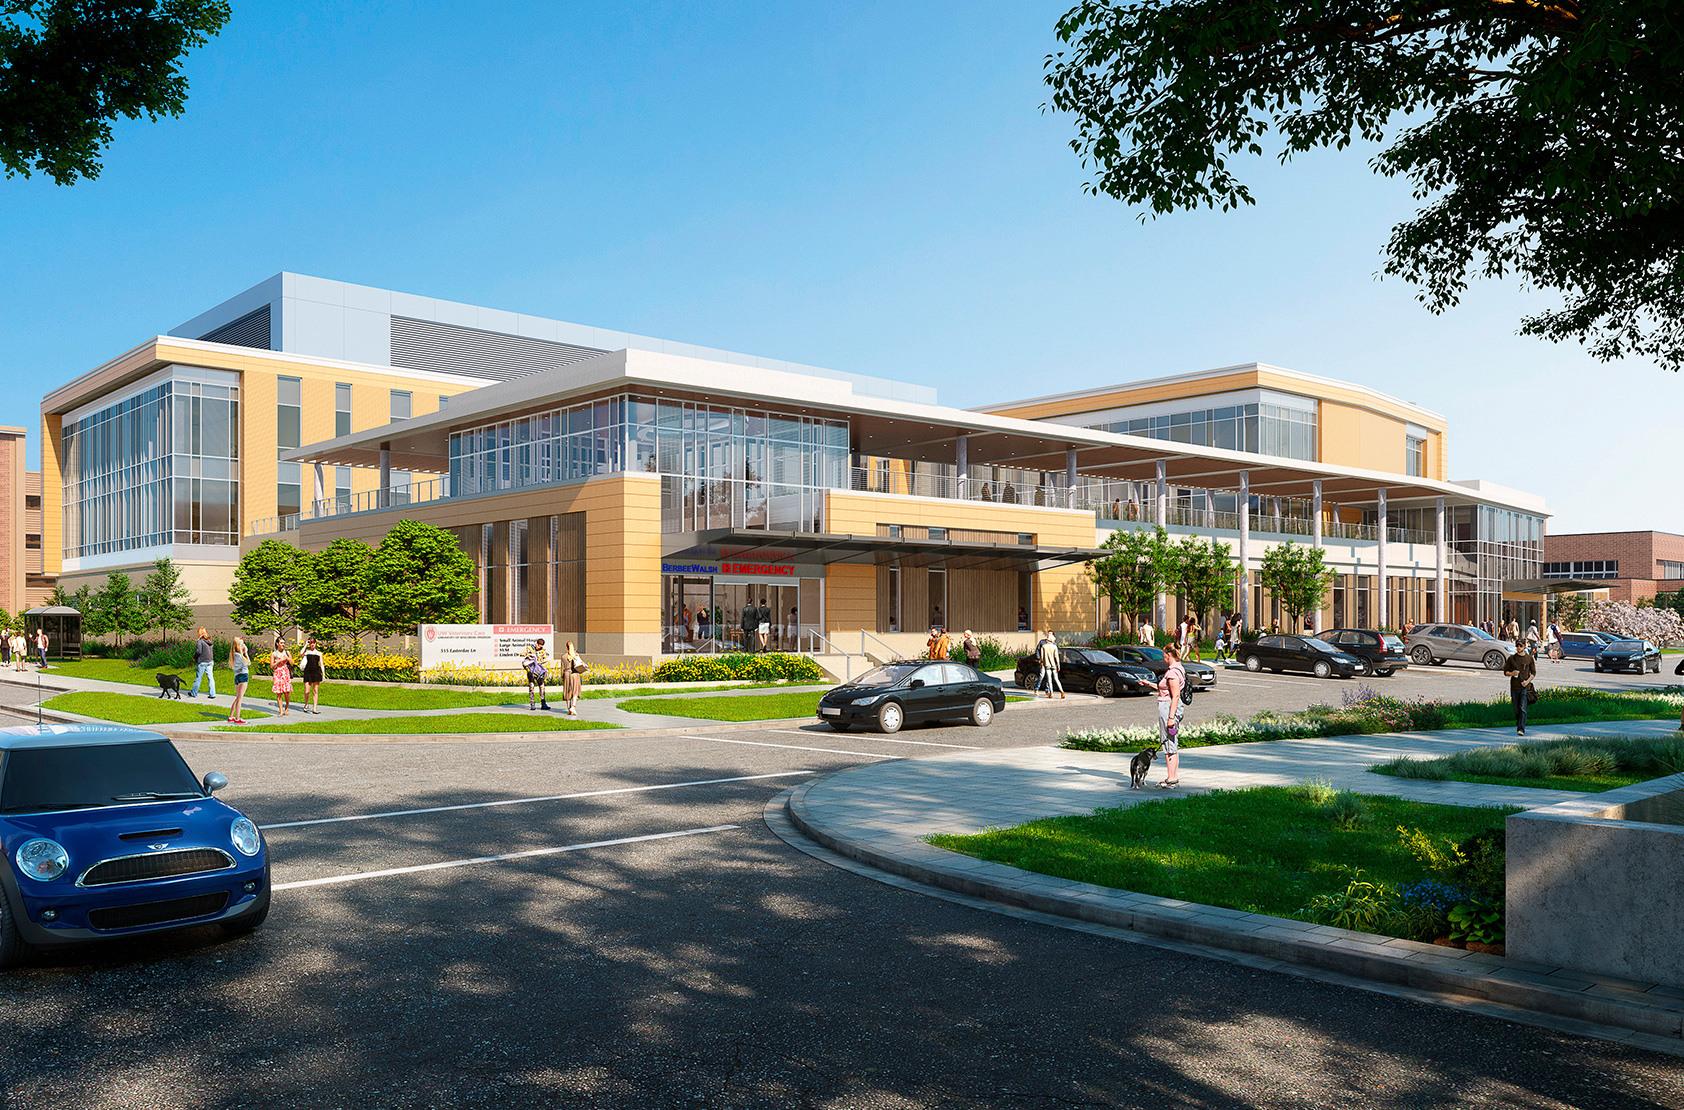 University of Wisconsin - Madison - School of Veterinary Medicine Addition and Renovation